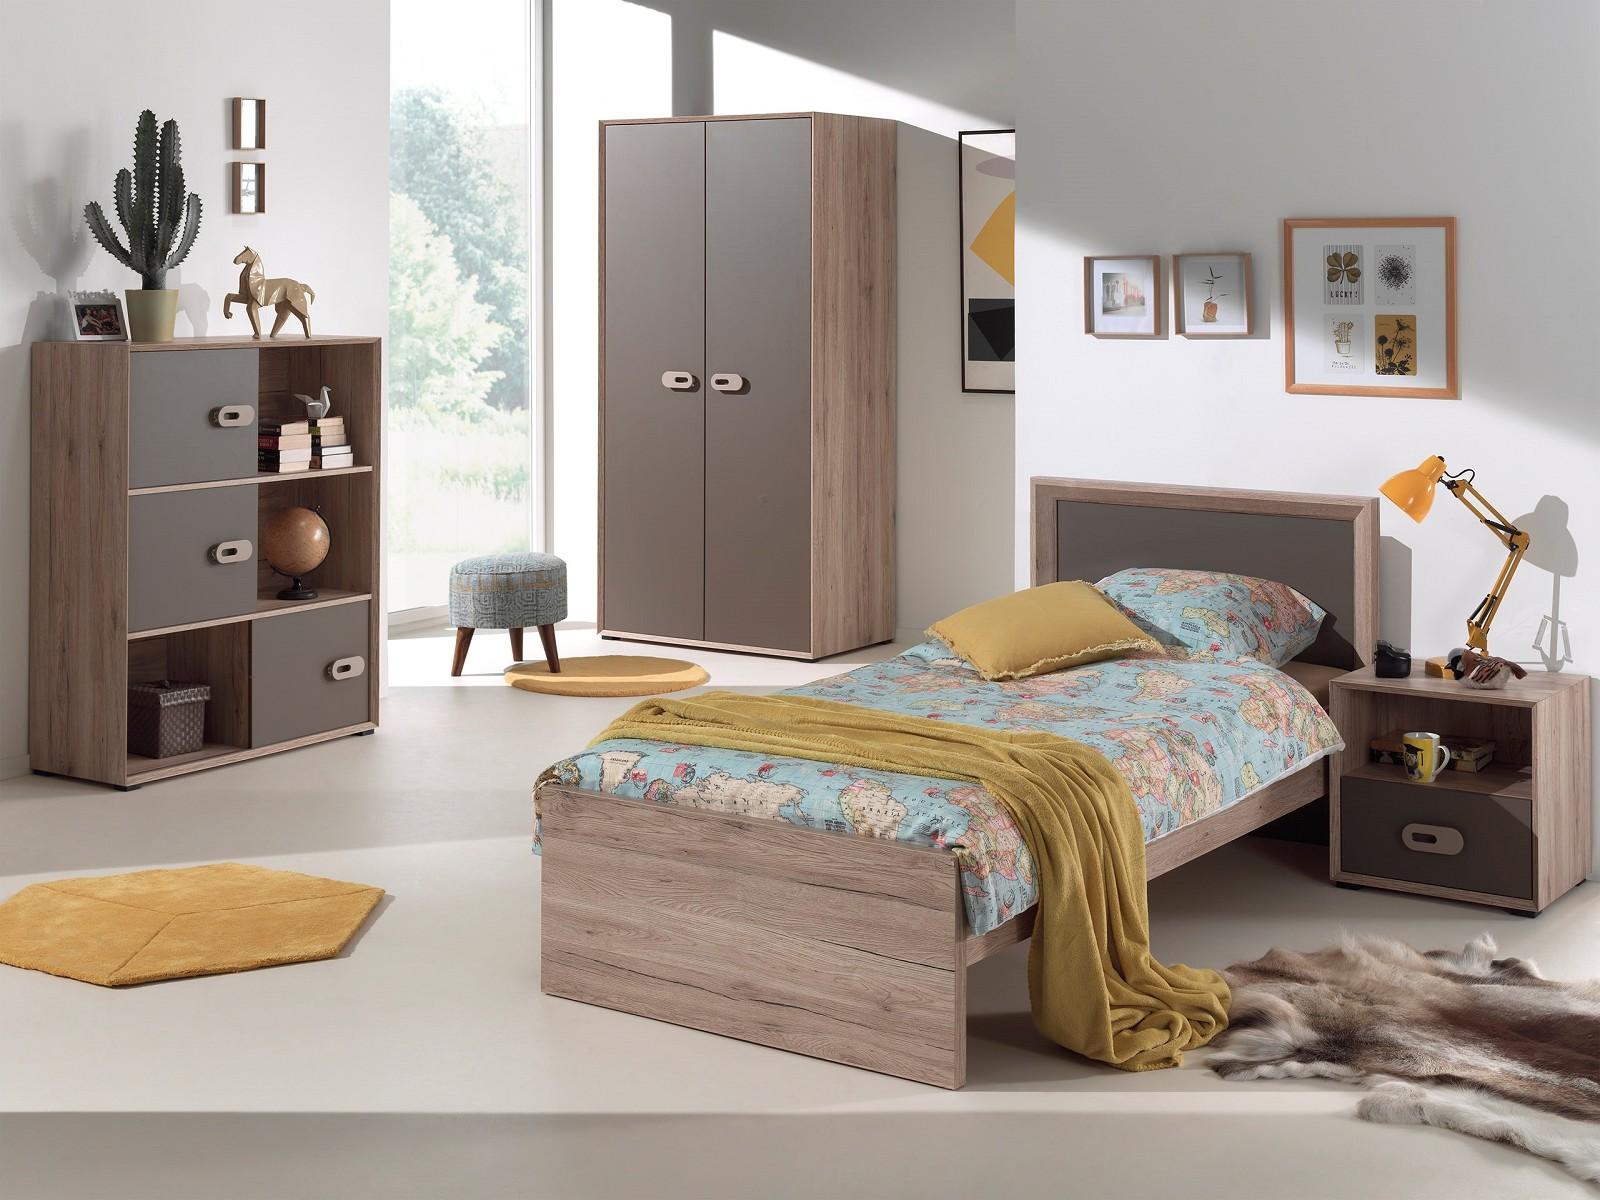 Full Size of Bcherregal Braun Mocca Online Kaufen Furnart Kinderzimmer Regal Raumteiler Sofa Weiß Regale Kinderzimmer Raumteiler Kinderzimmer